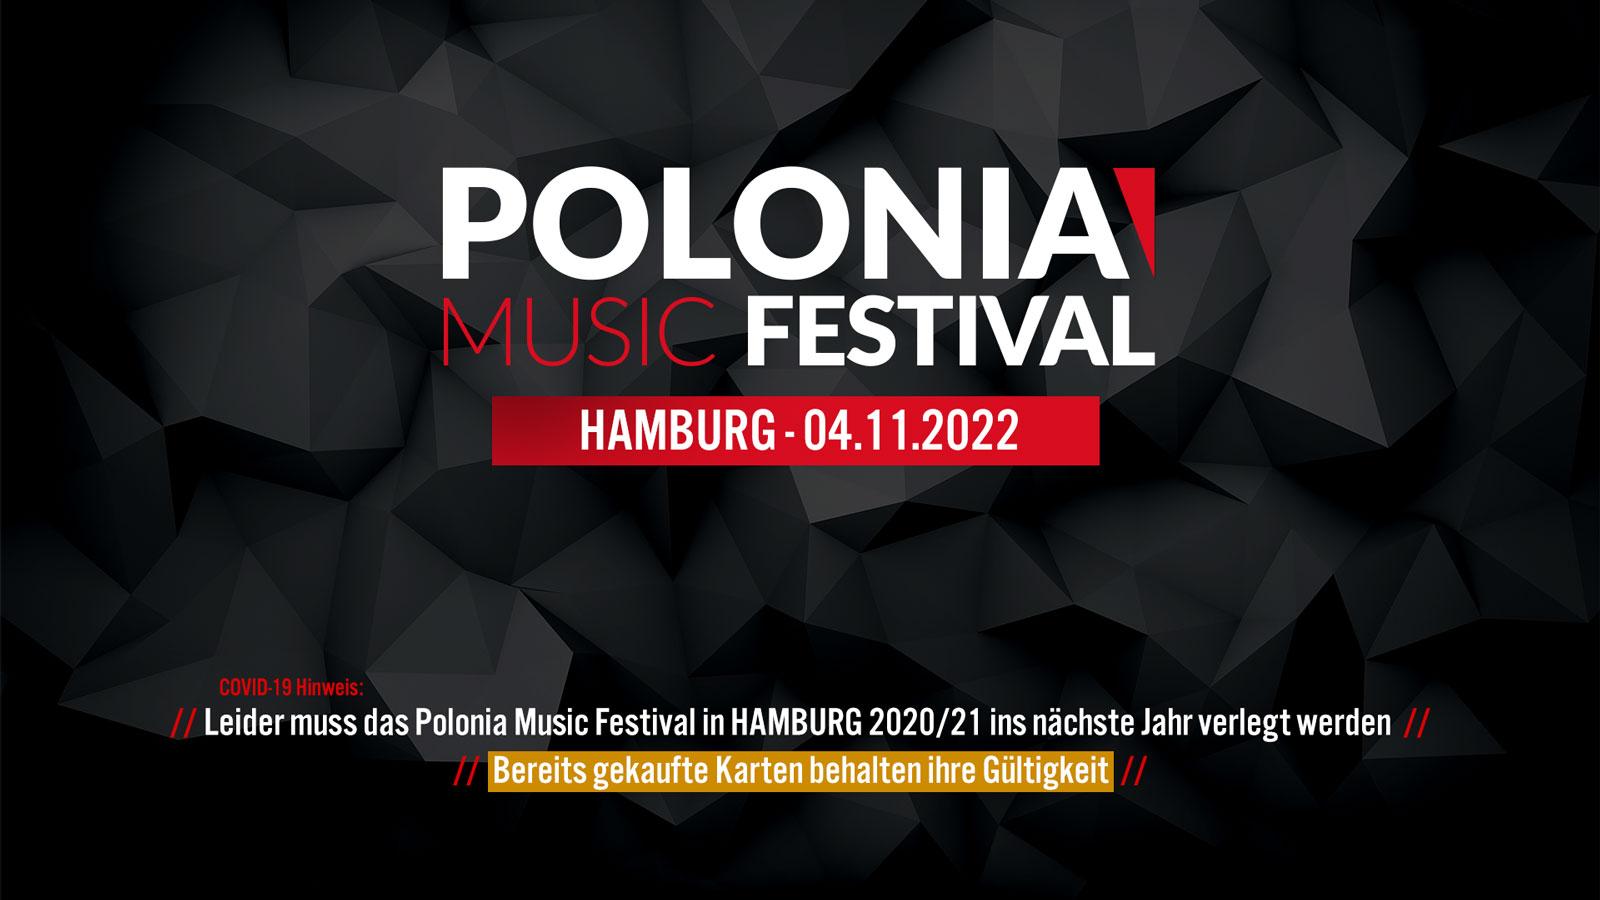 Polonia Music Festival Hamburg 2022